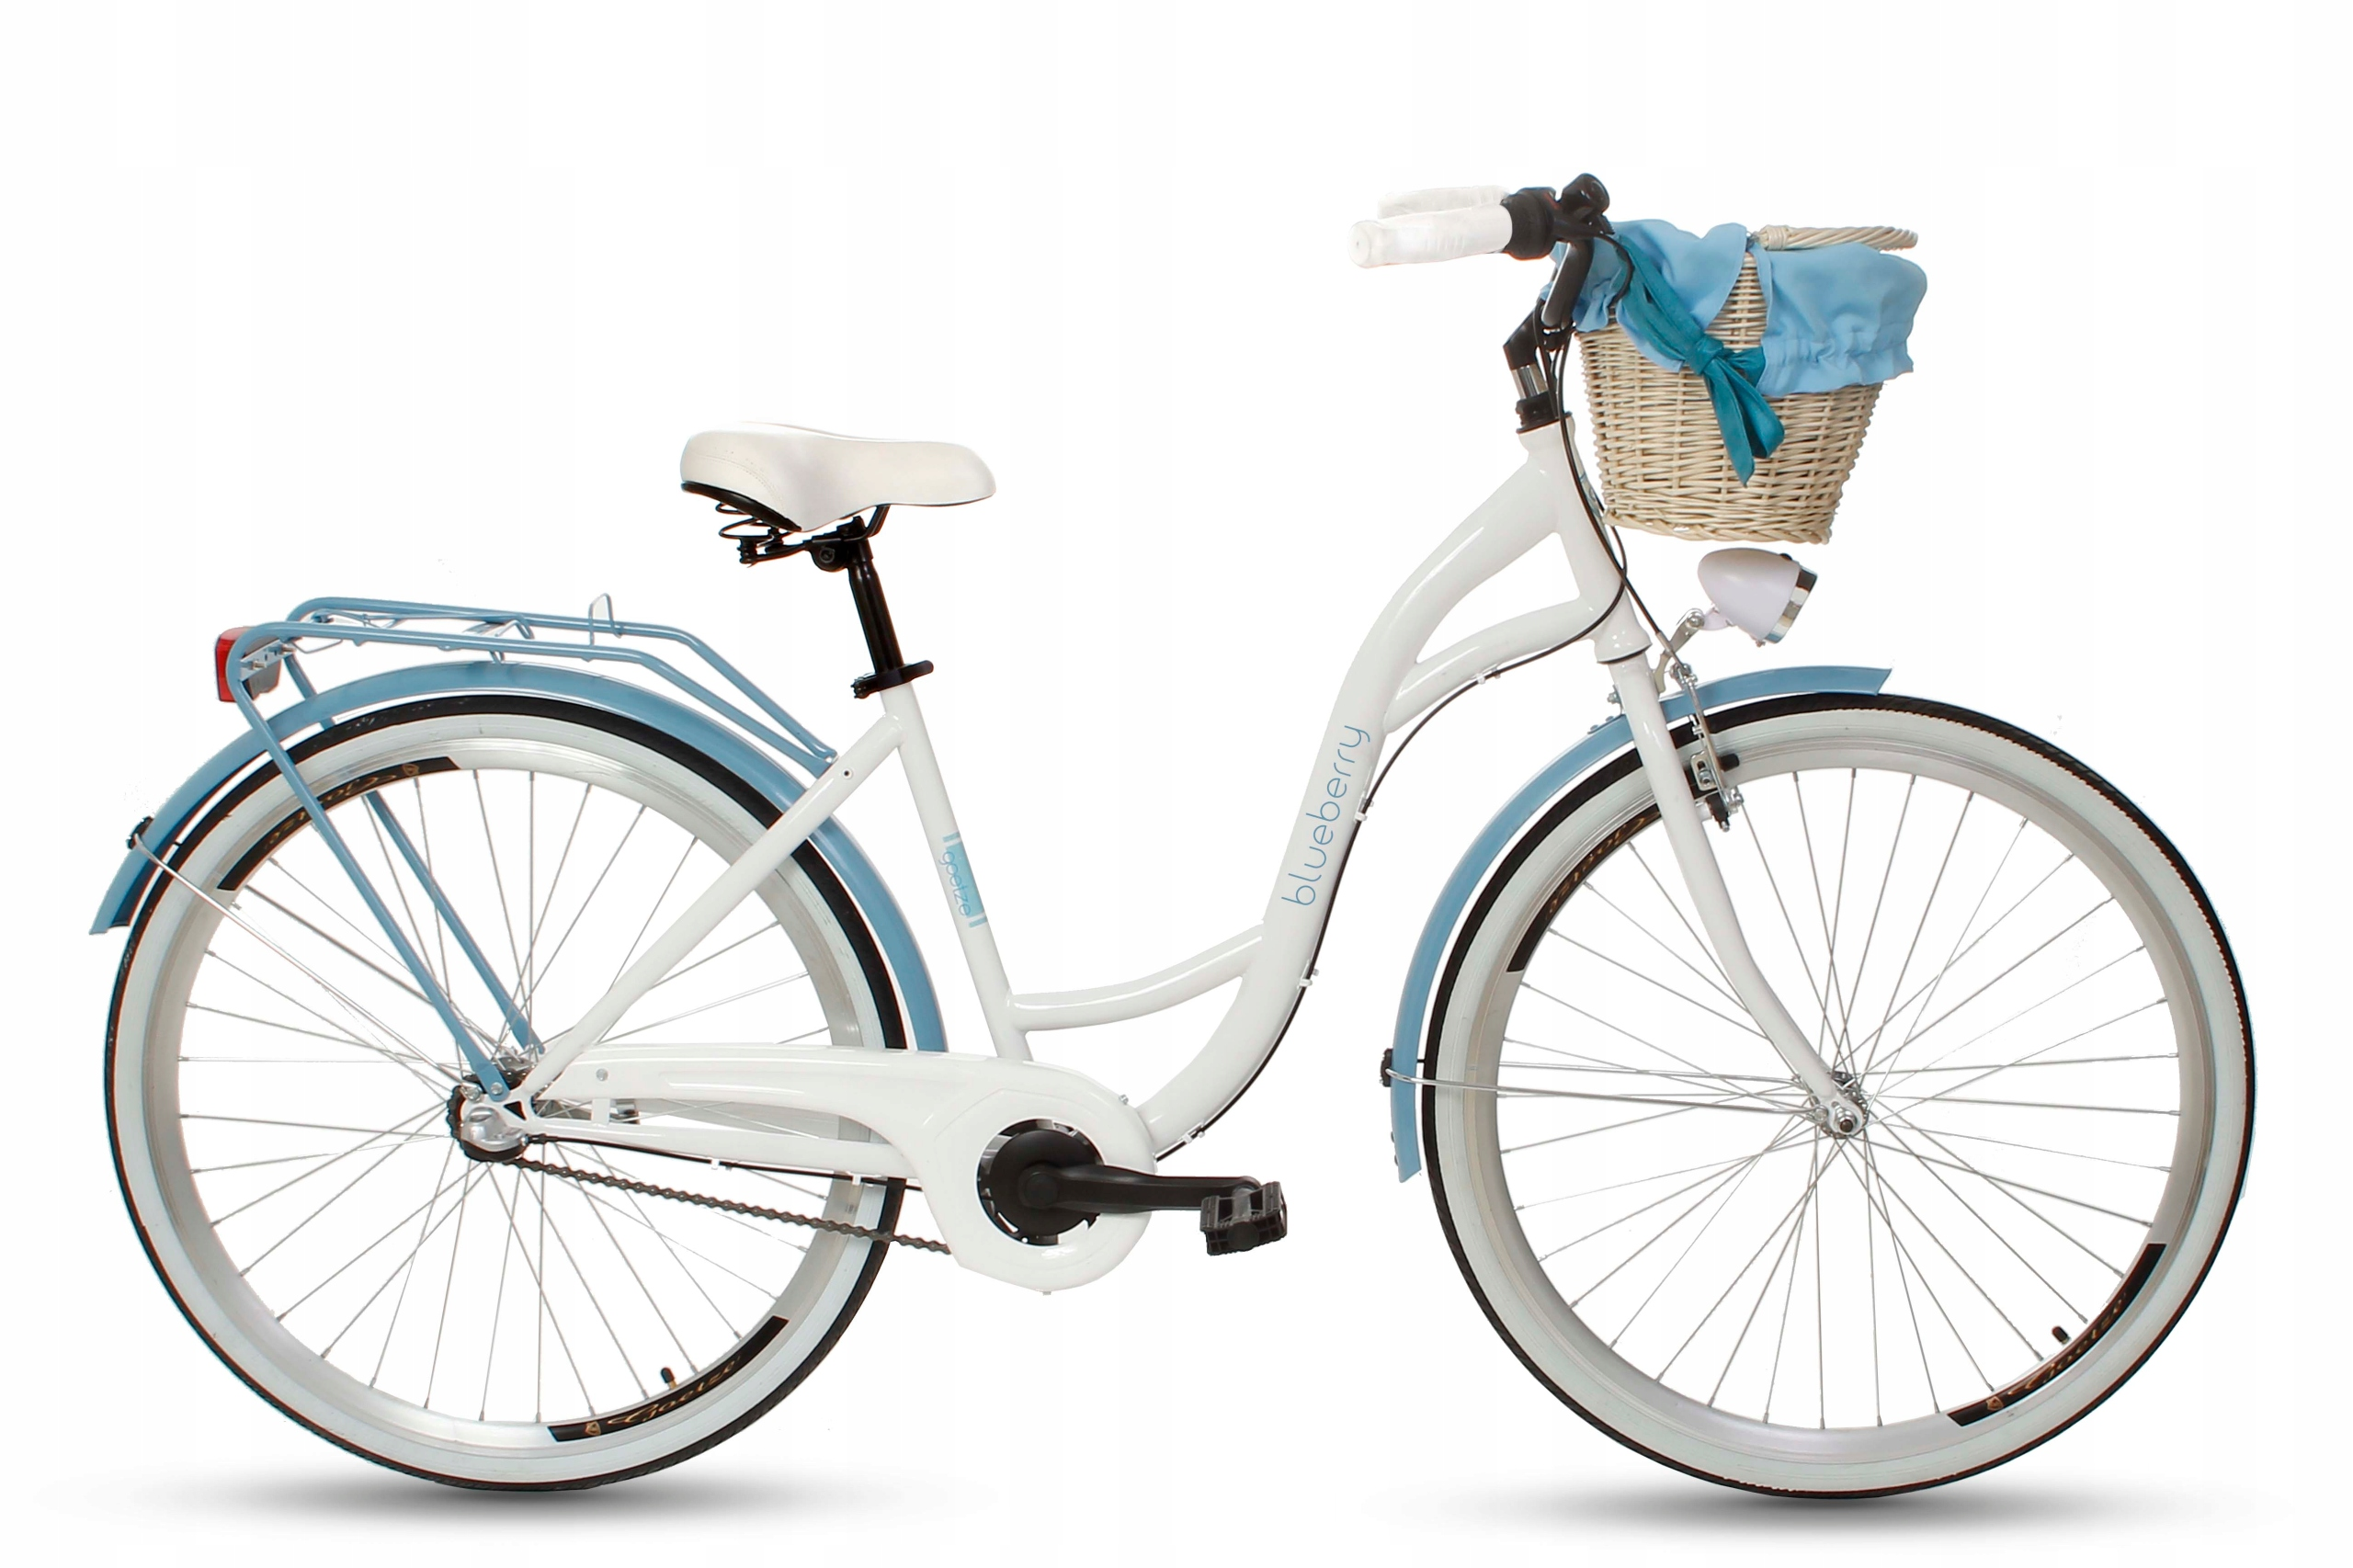 "Dámsky mestský bicykel Goetze BLUEBERRY 28 3b košík!  Veľkosť kolies ("") 28"